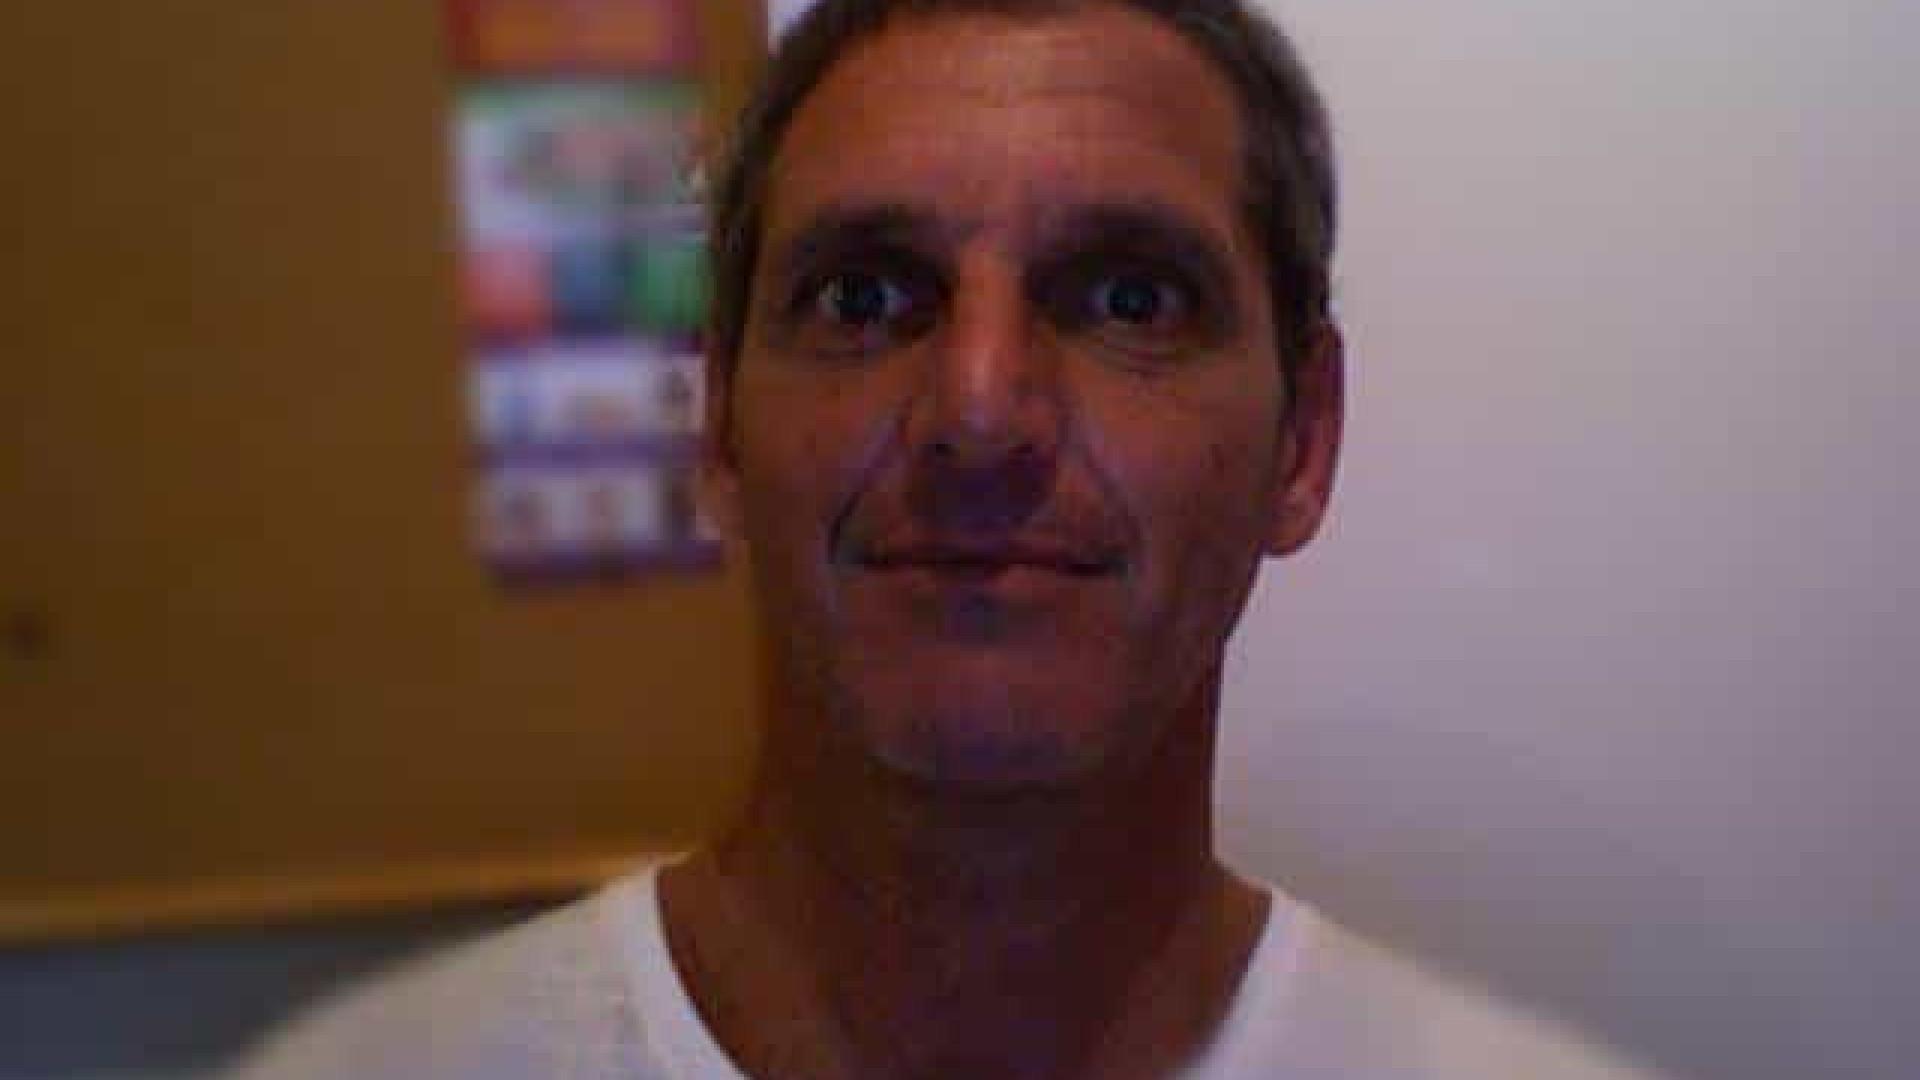 Flavio Goldemberg Morre De Enfarte Aos 58 Anos